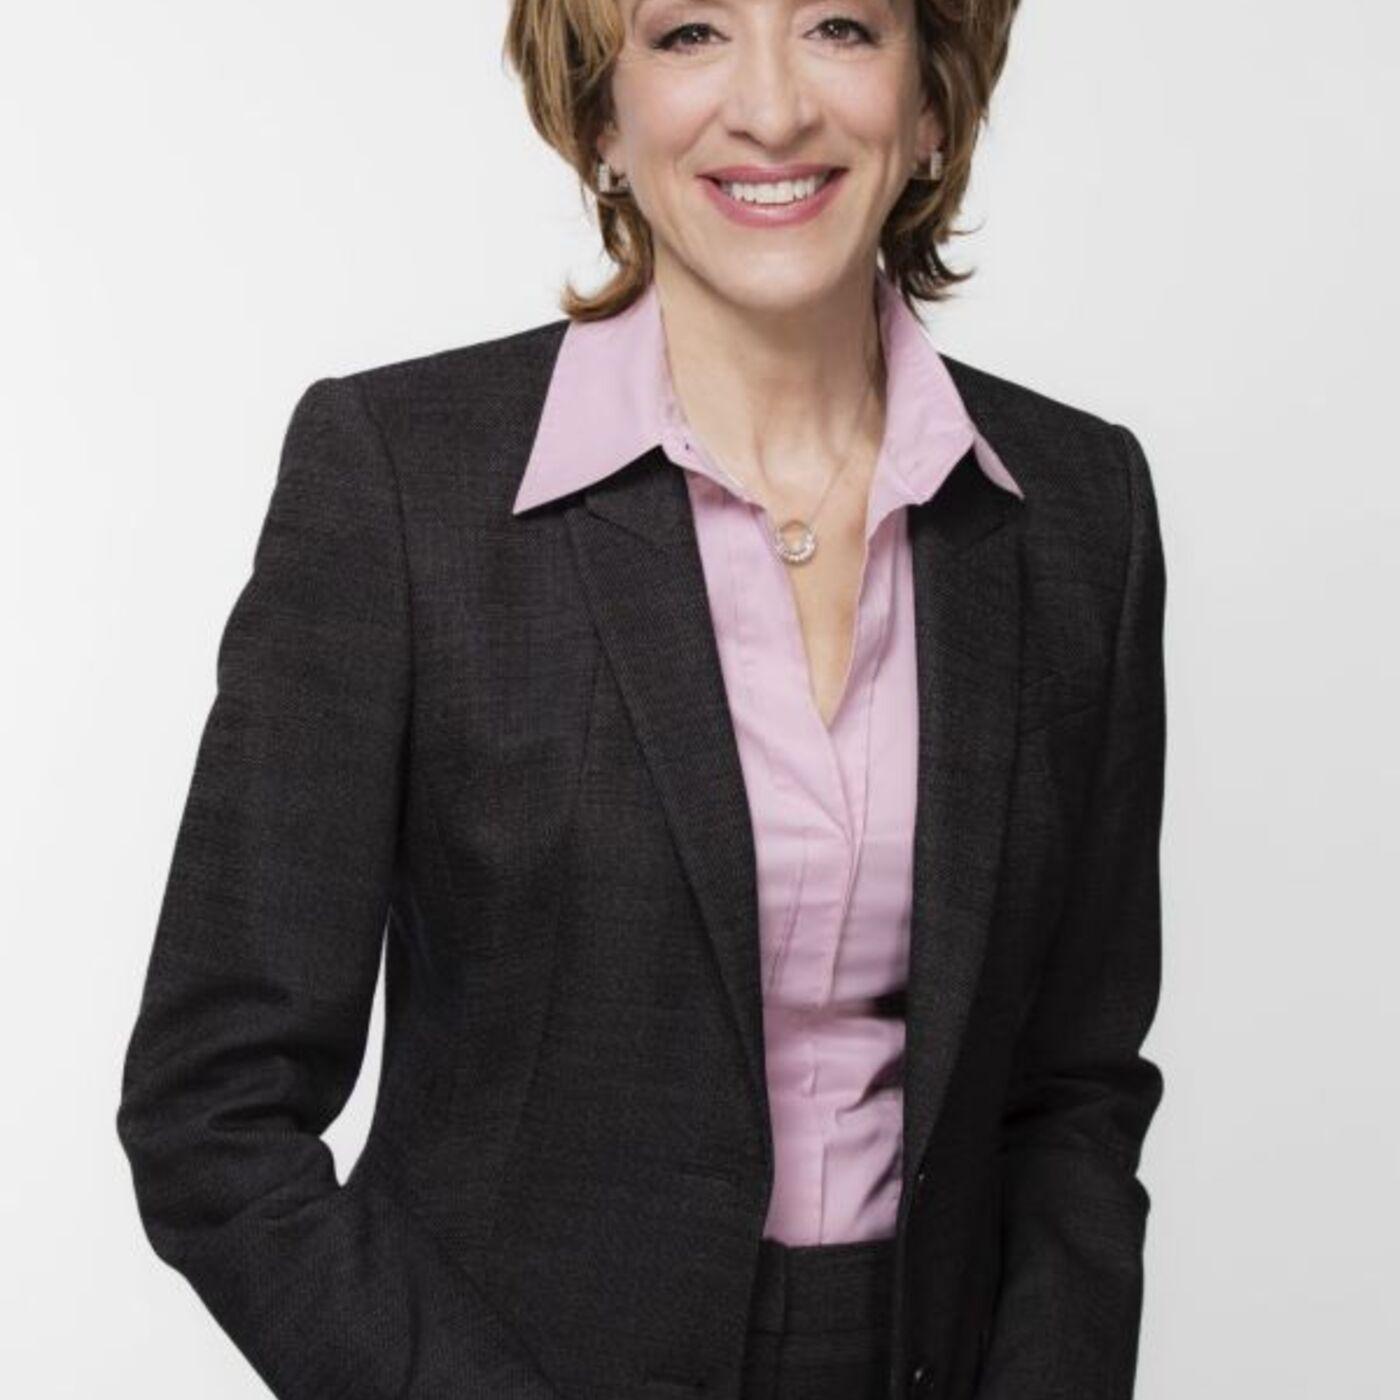 Cindy DiBiasi of 3D Communications